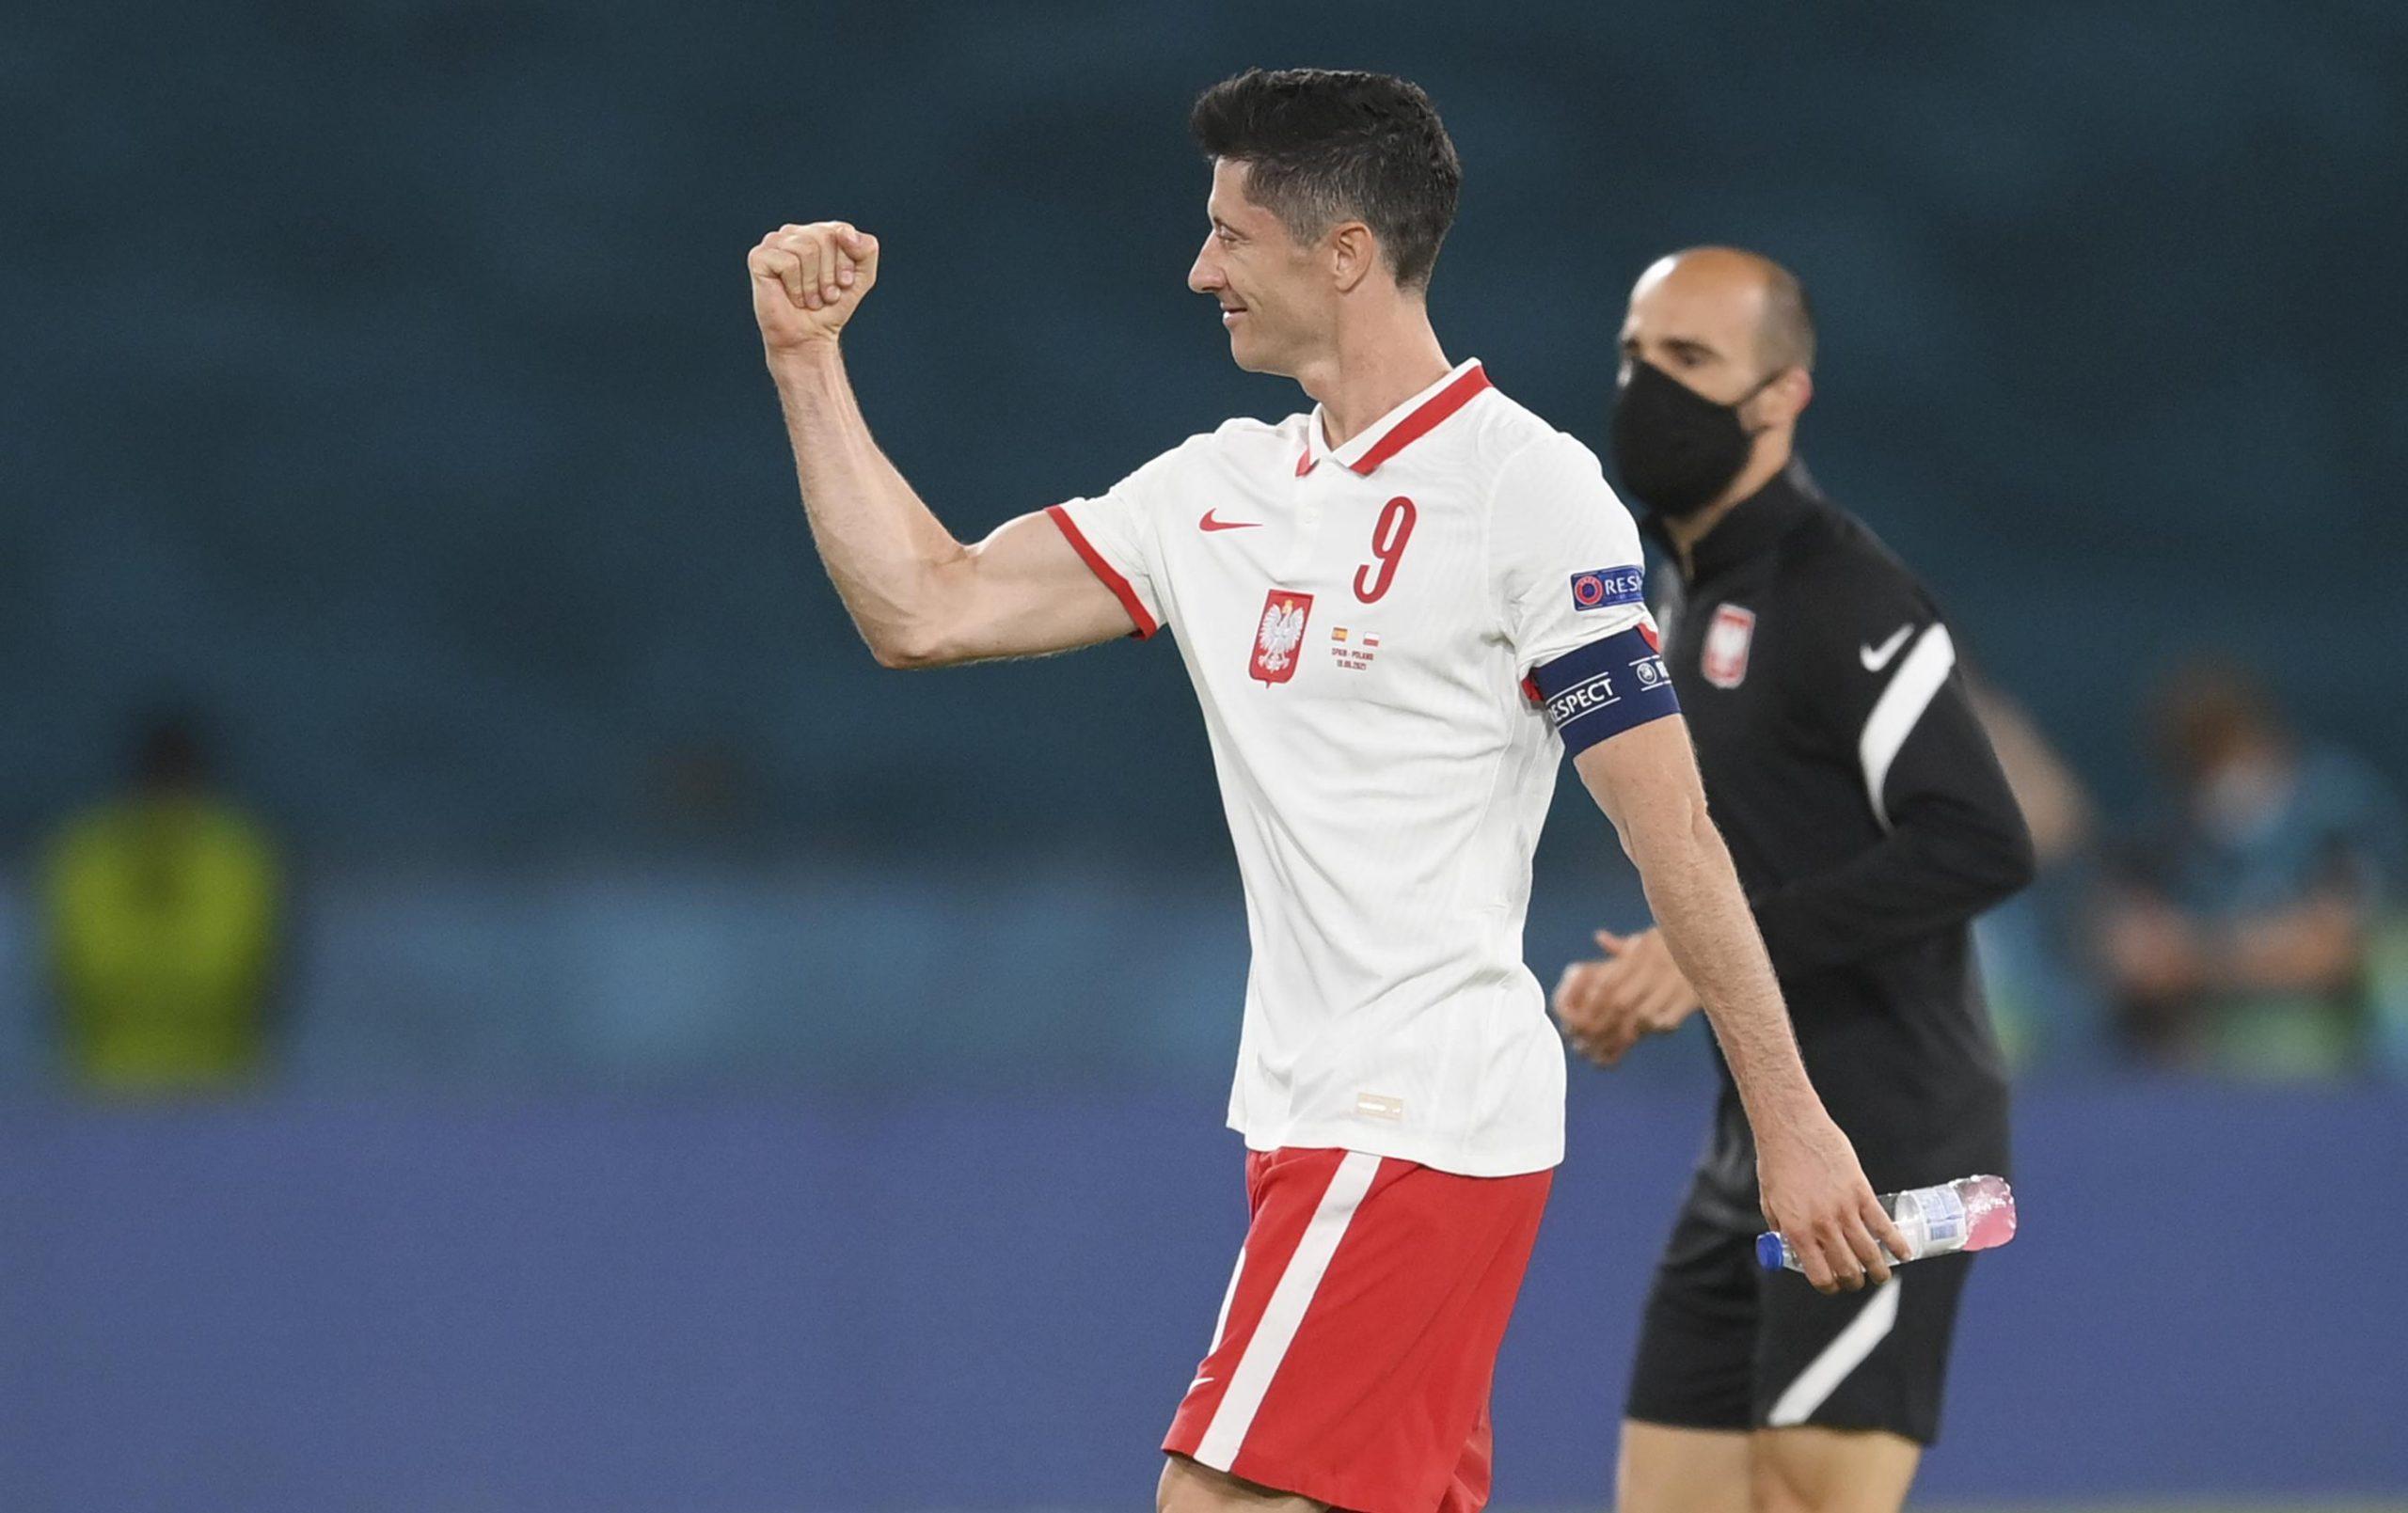 Euro 2020: Poland Draw 1-1 with Spain